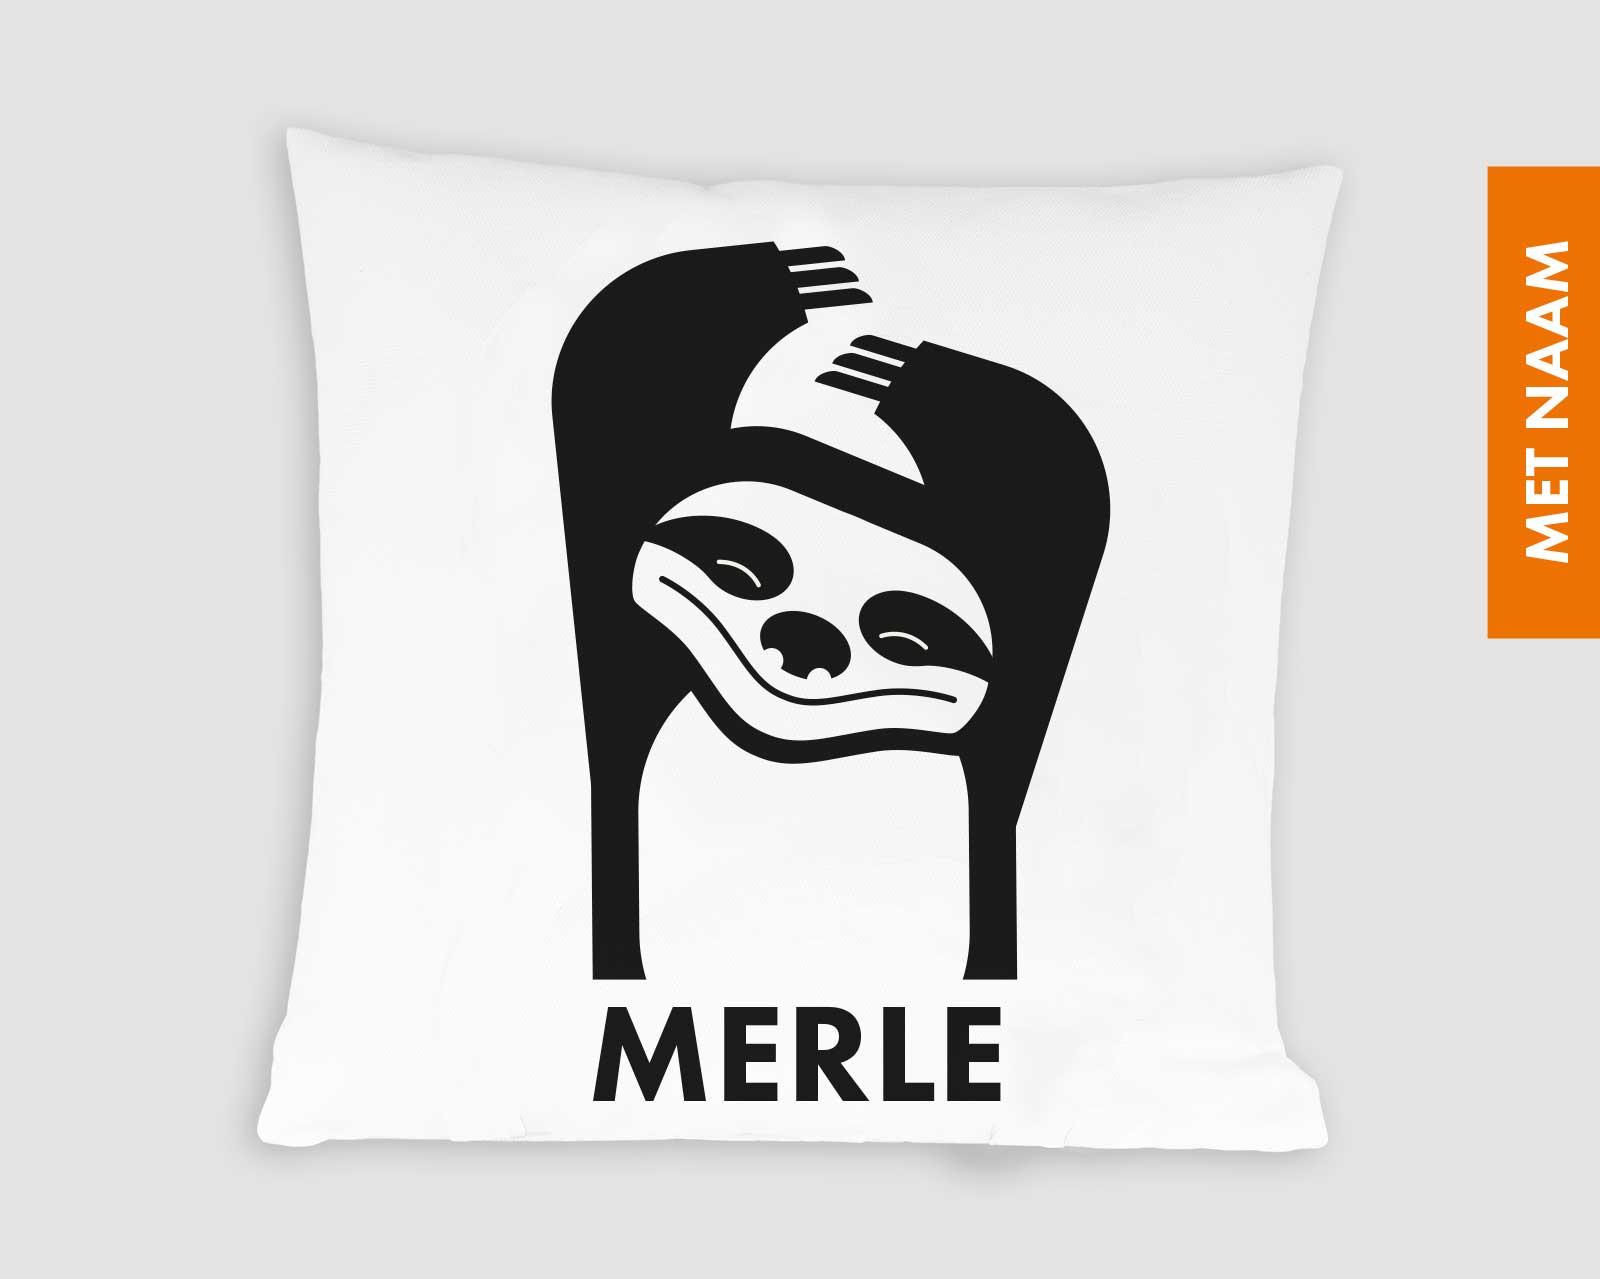 Kussenhoes gepersonaliseerd kraamcadeau met naam kinderkamer zwart-wit print luiaard Pie Slothy zwart wit print 40x40 cm